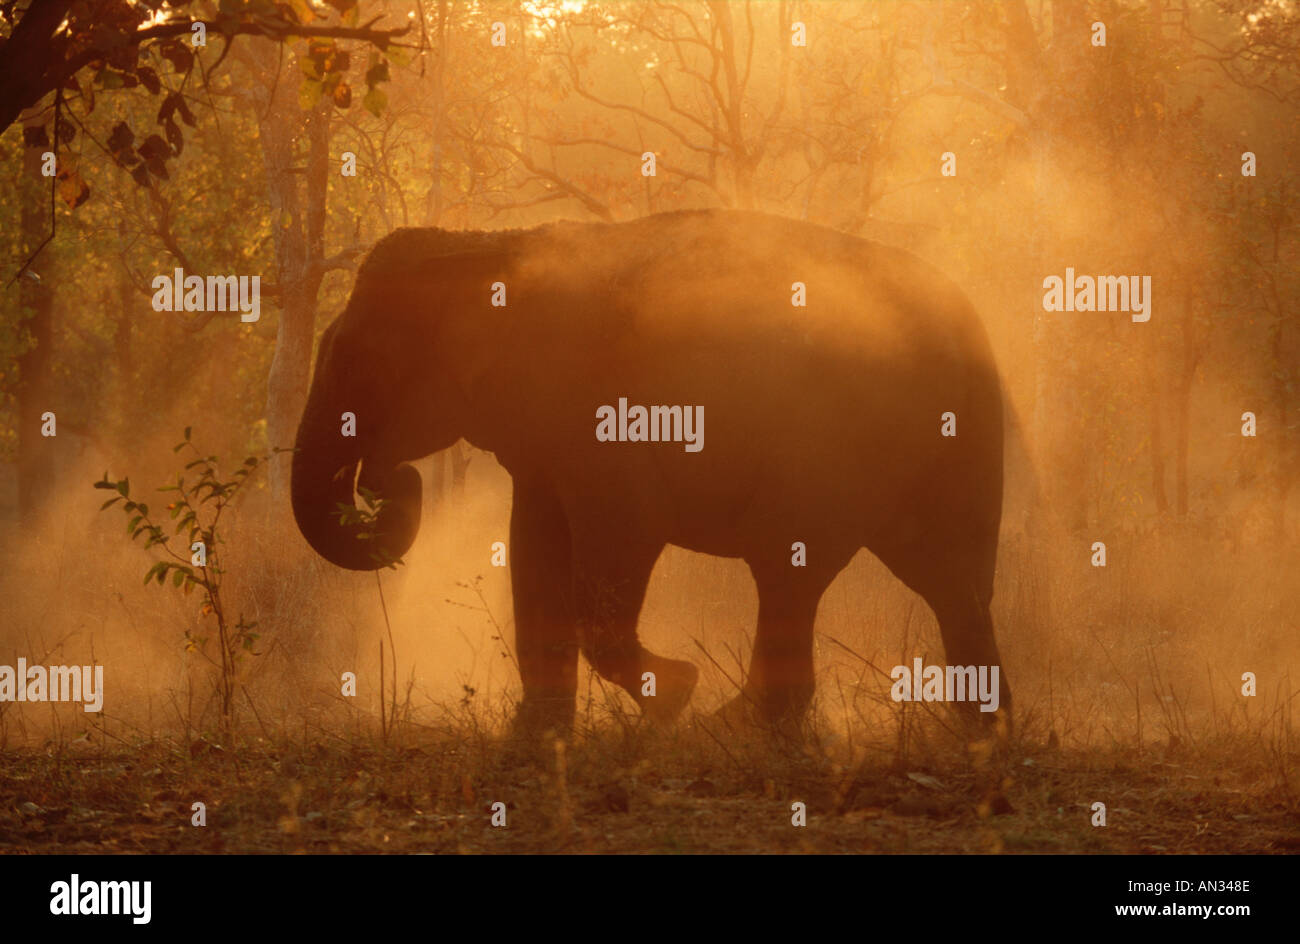 Indische Elefanten Elephus Maximus asiatischen Elefanten genießen Staub baden Kahna Nationalpark Indien Stockbild